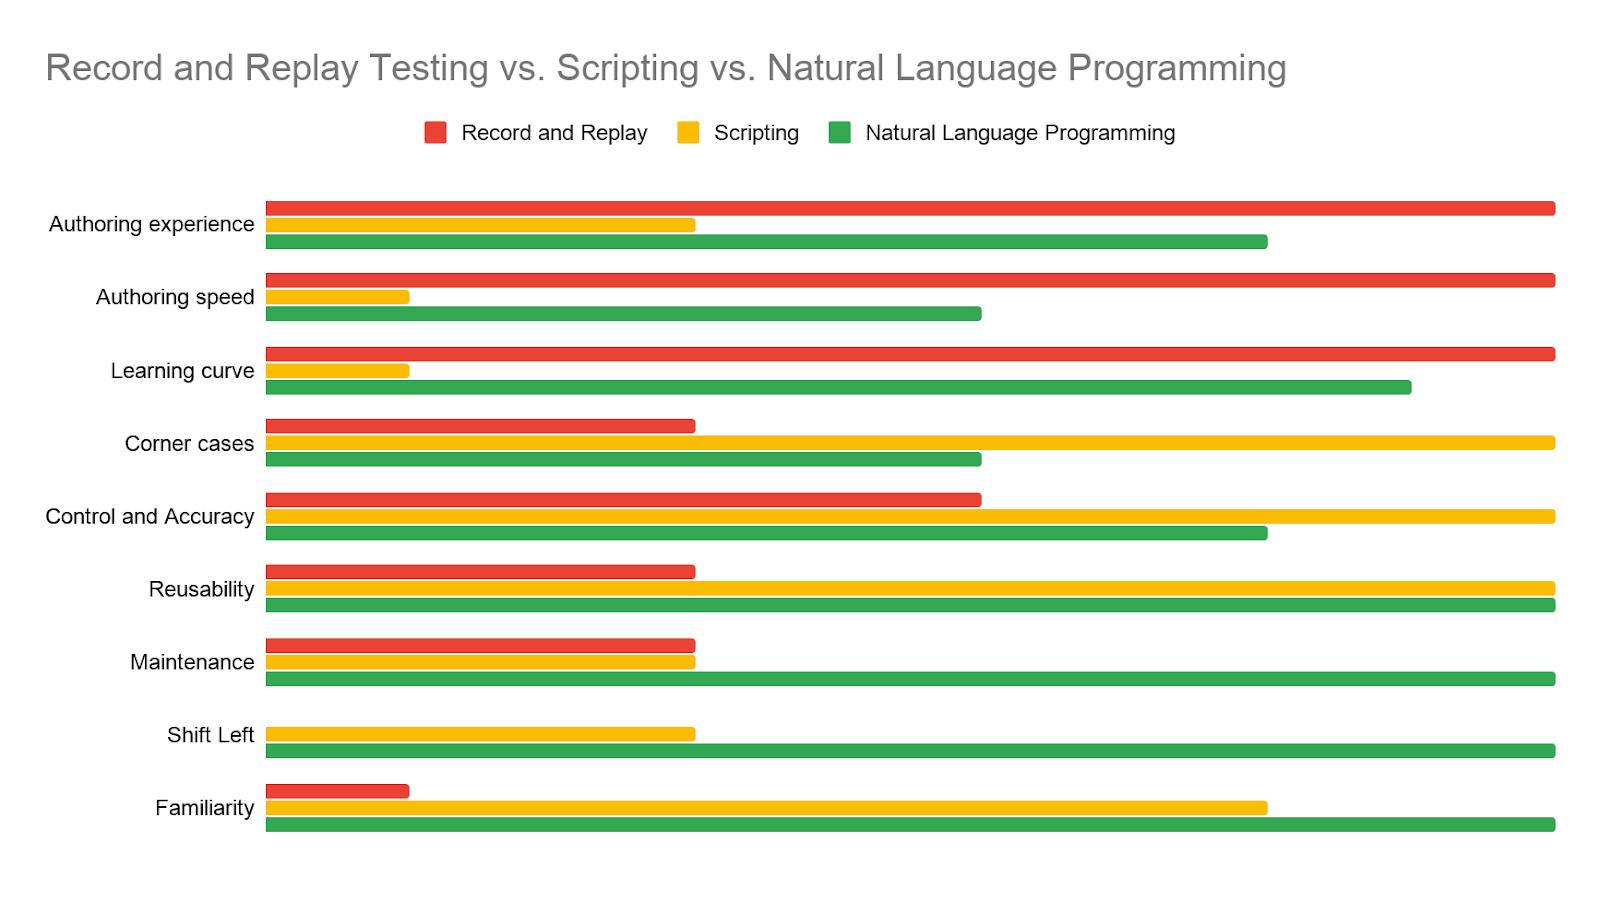 Record and Replay Testing vs Scripting vs Natural Language Programming